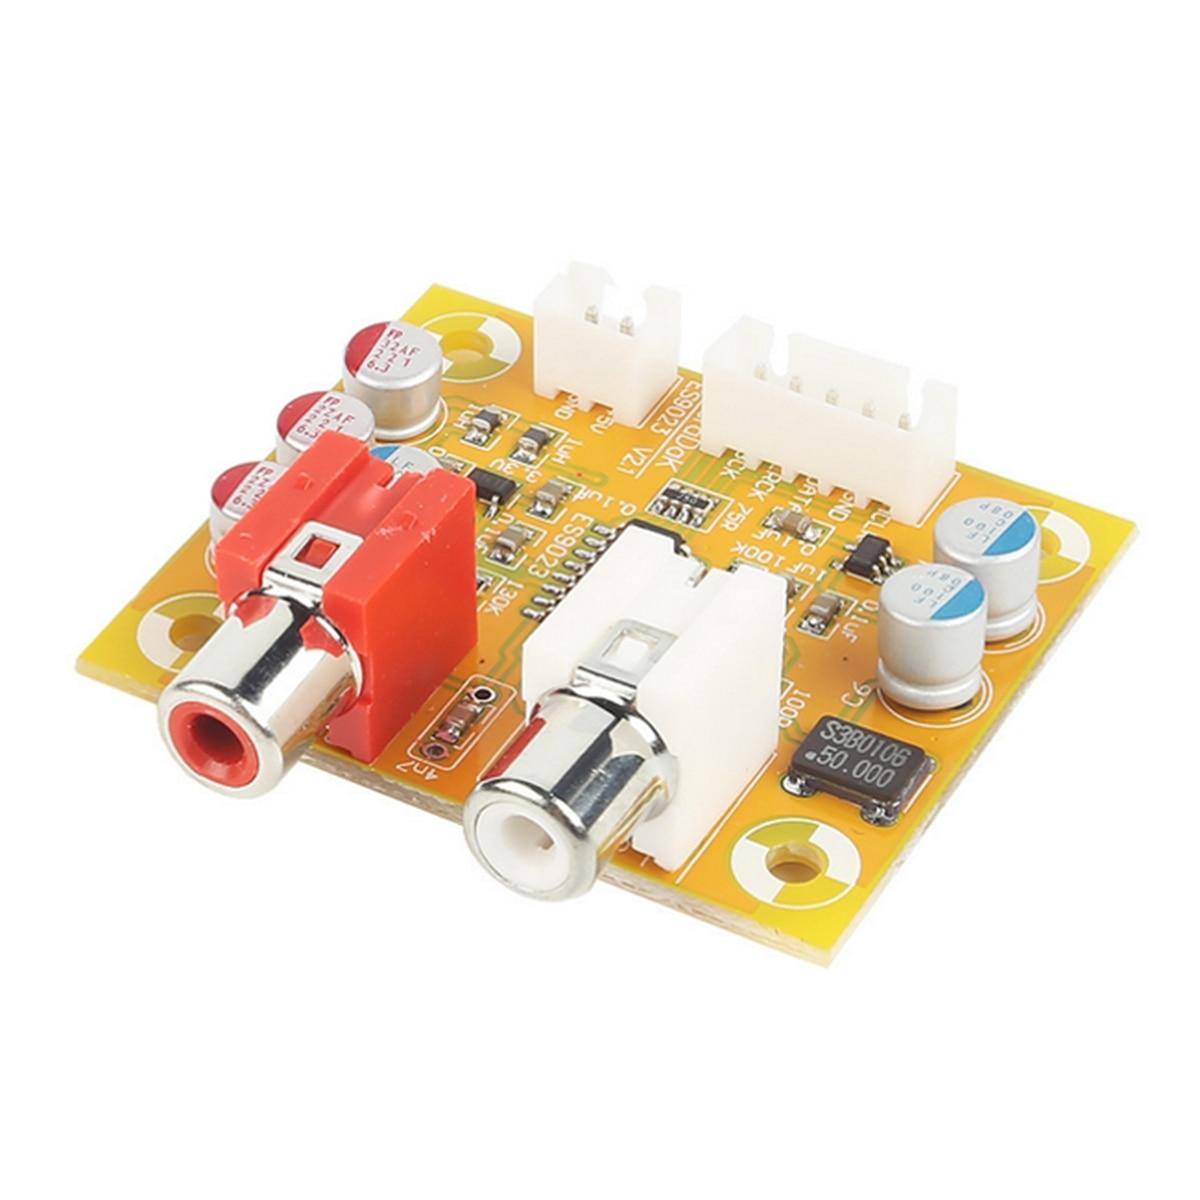 1PCS Audiophonics DAC Sabre ES9023 I2S vers Analogique 24bit//192KHZ Raspberry PI